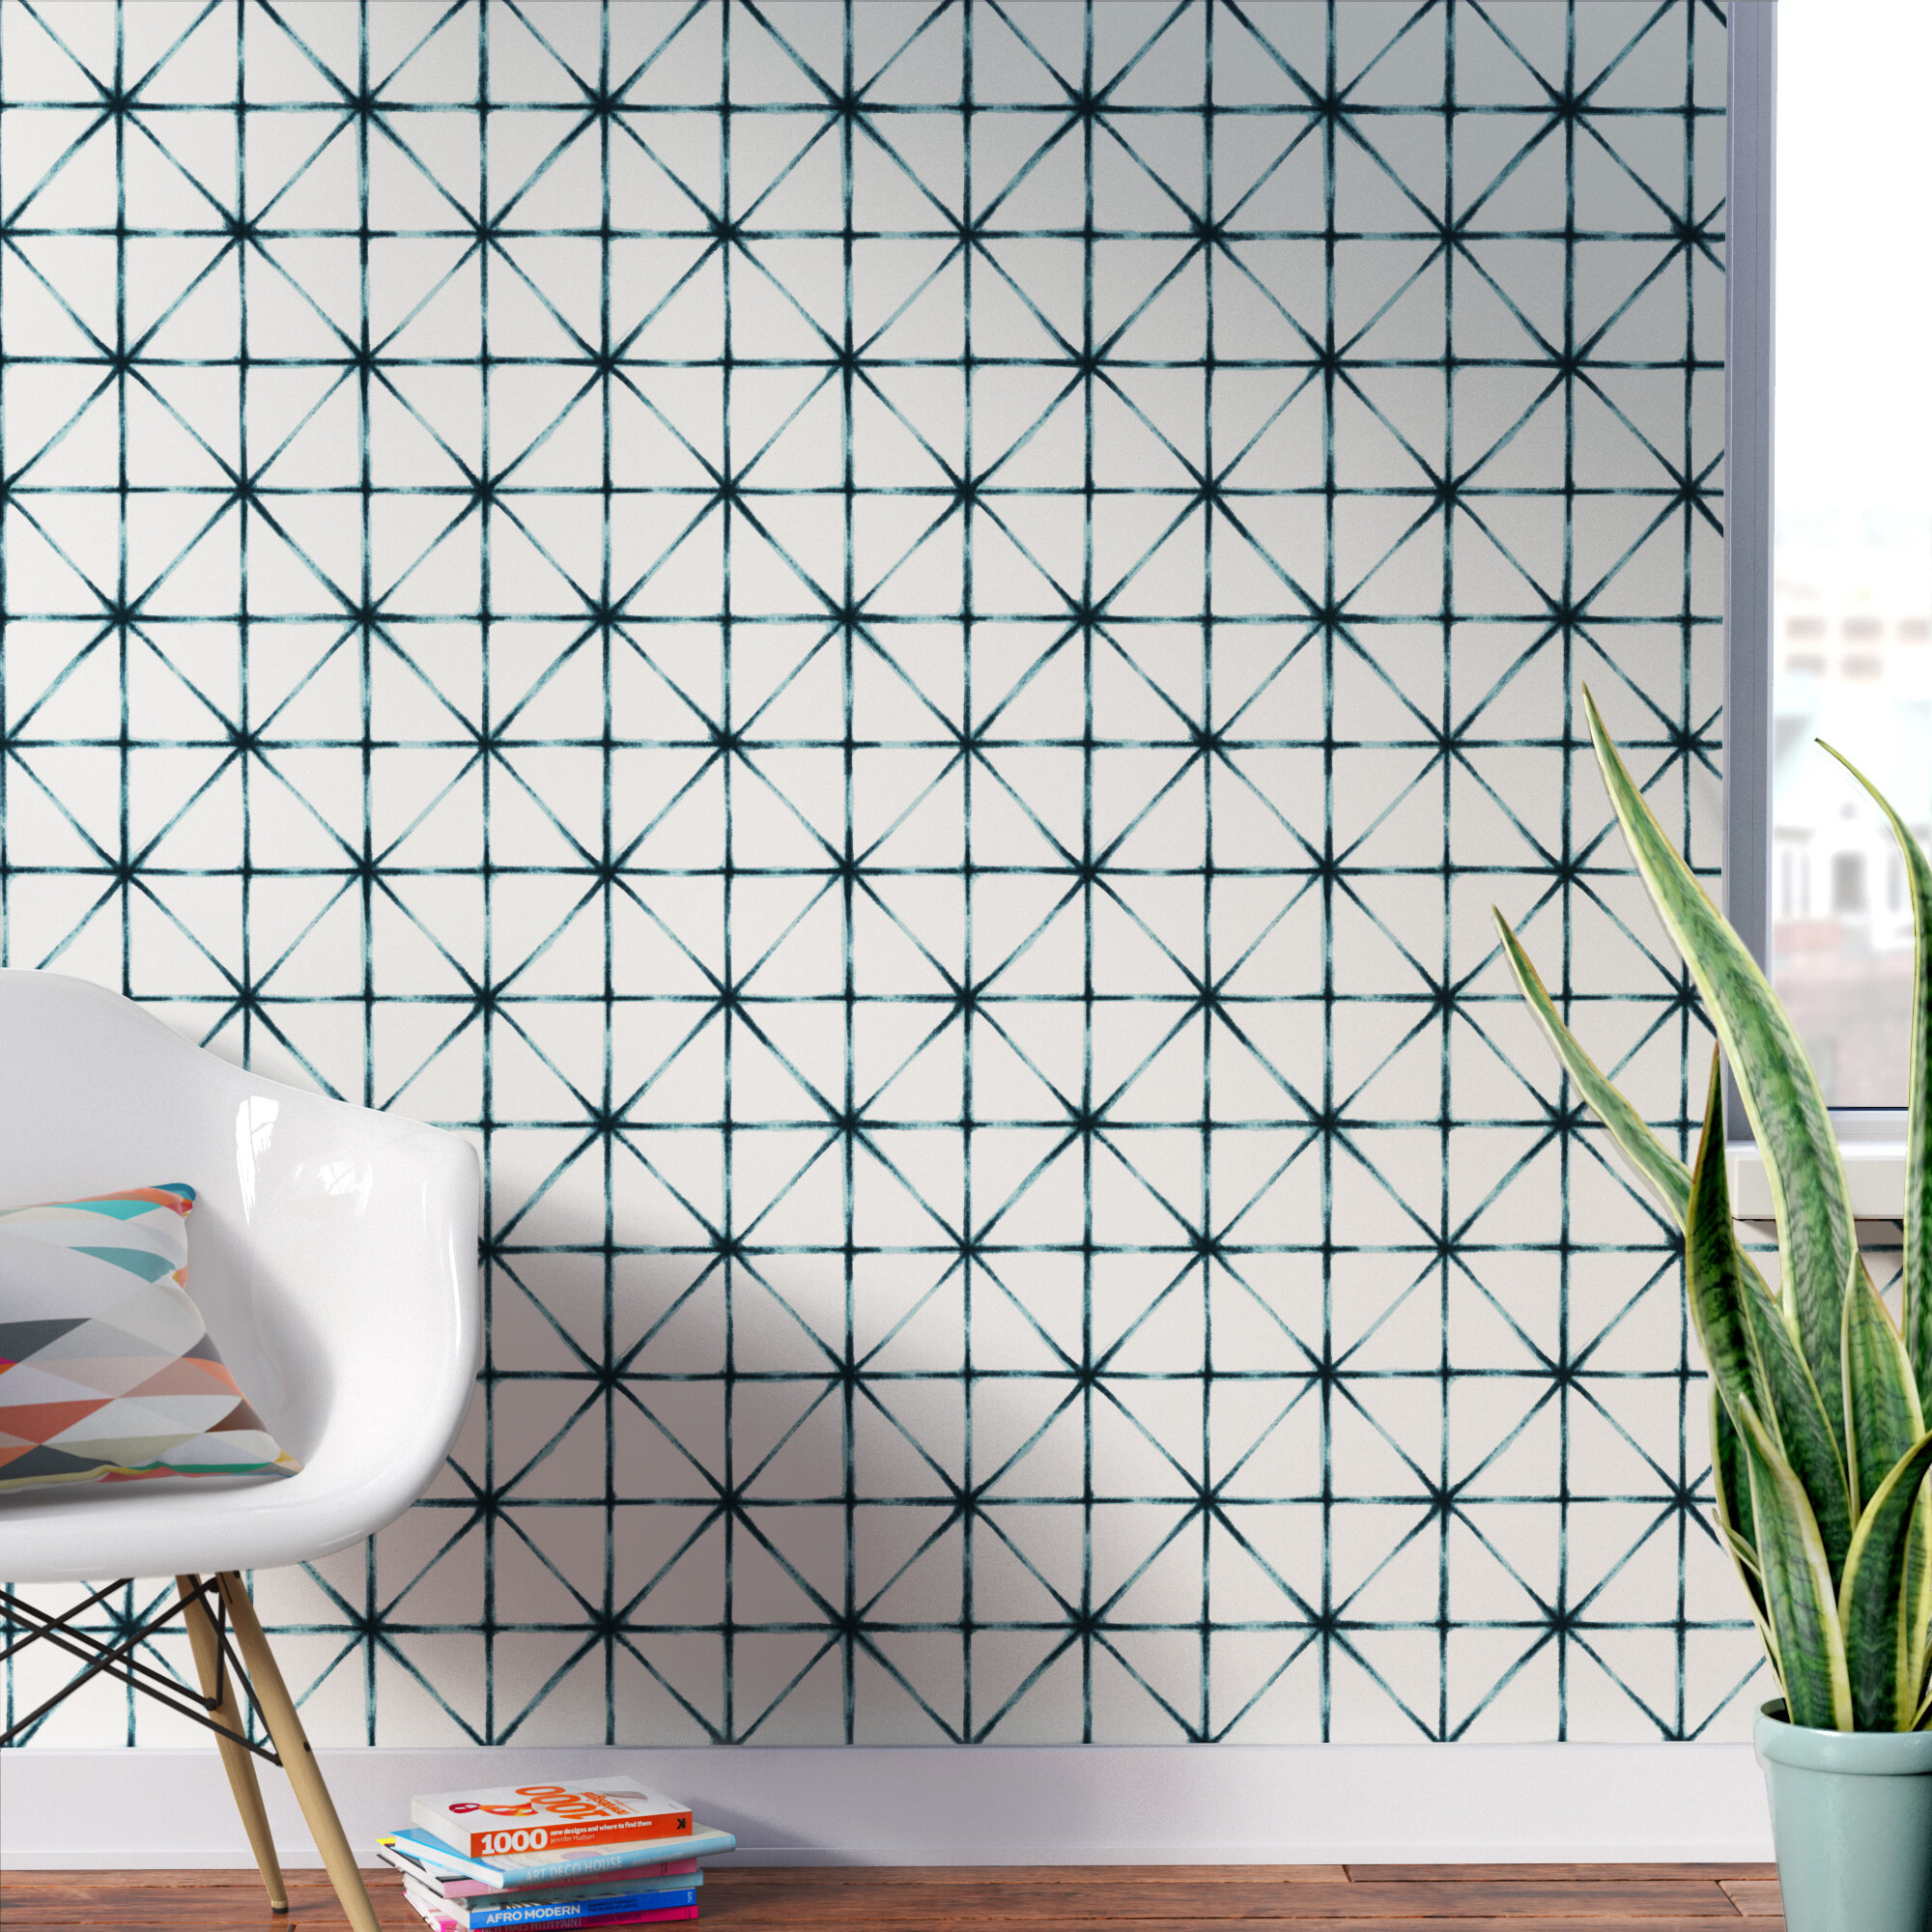 Wrought Studio Folden Modern 16 5 L X 20 5 W Geometric Peel And Stick Wallpaper Roll Reviews Wayfair